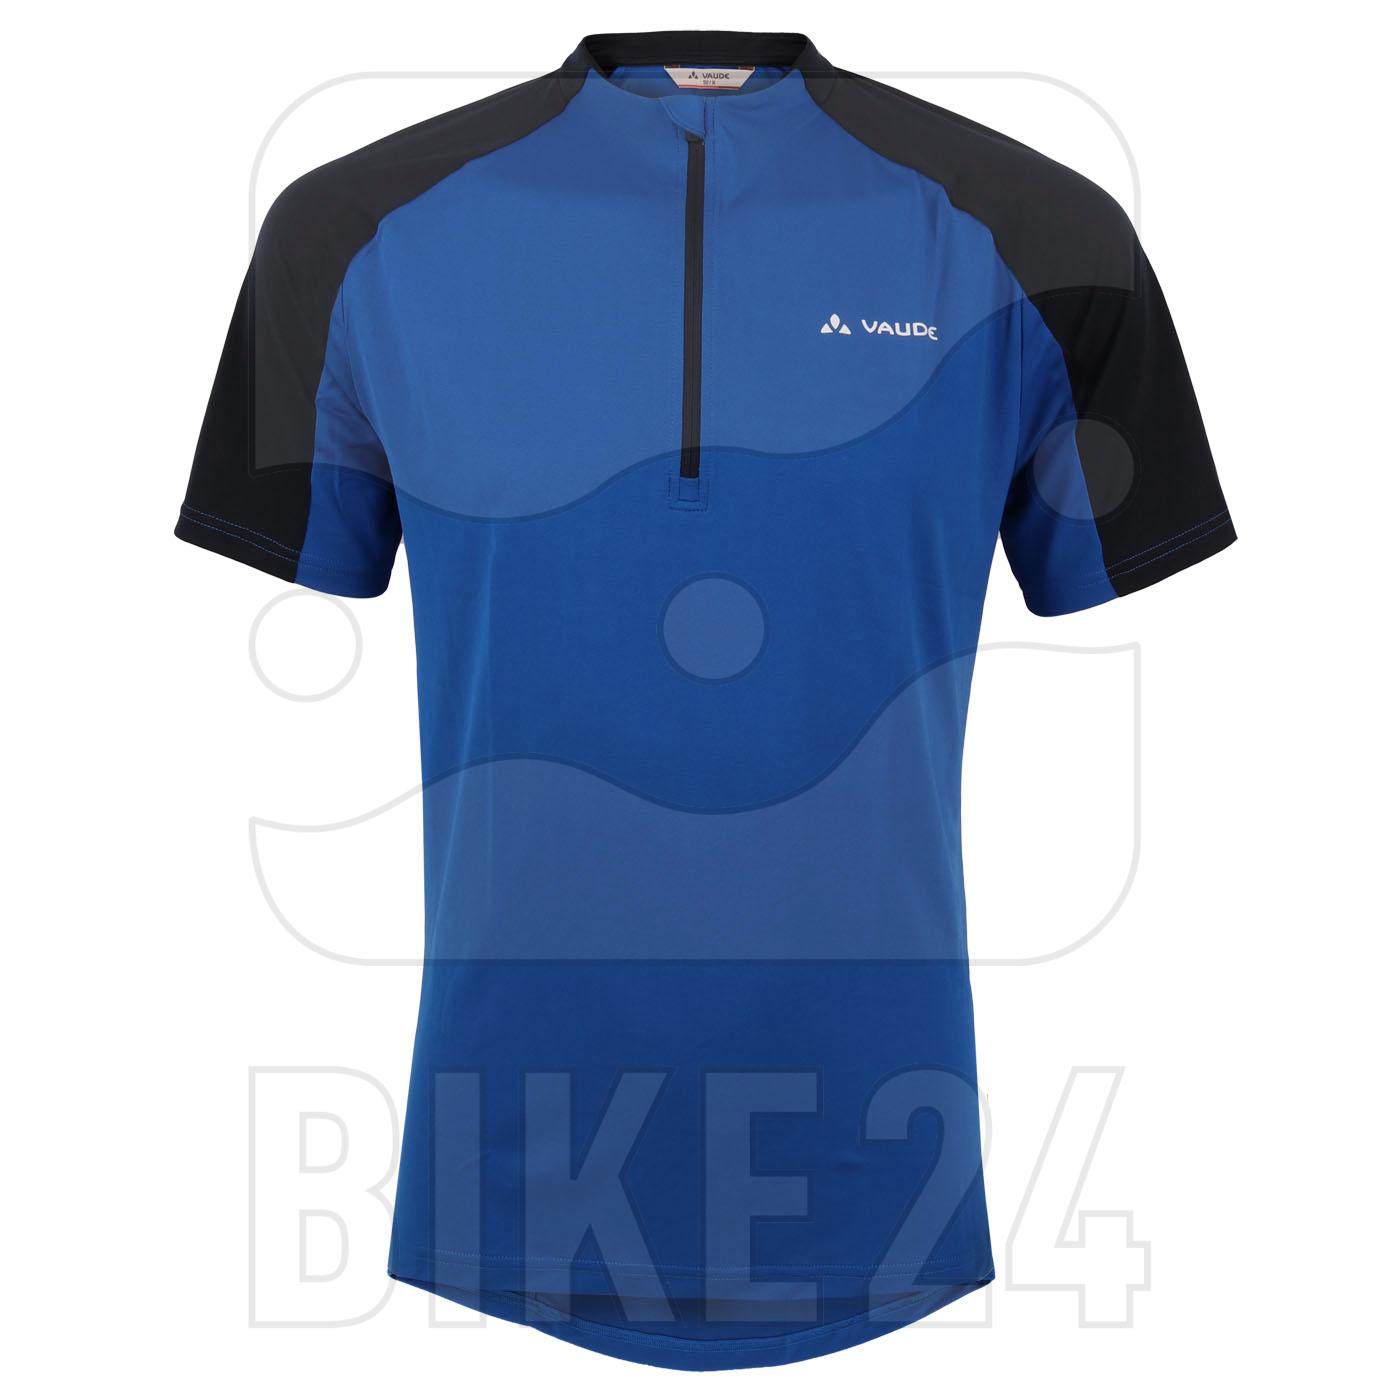 Vaude SE Maro Hzip Shirt - signal blue